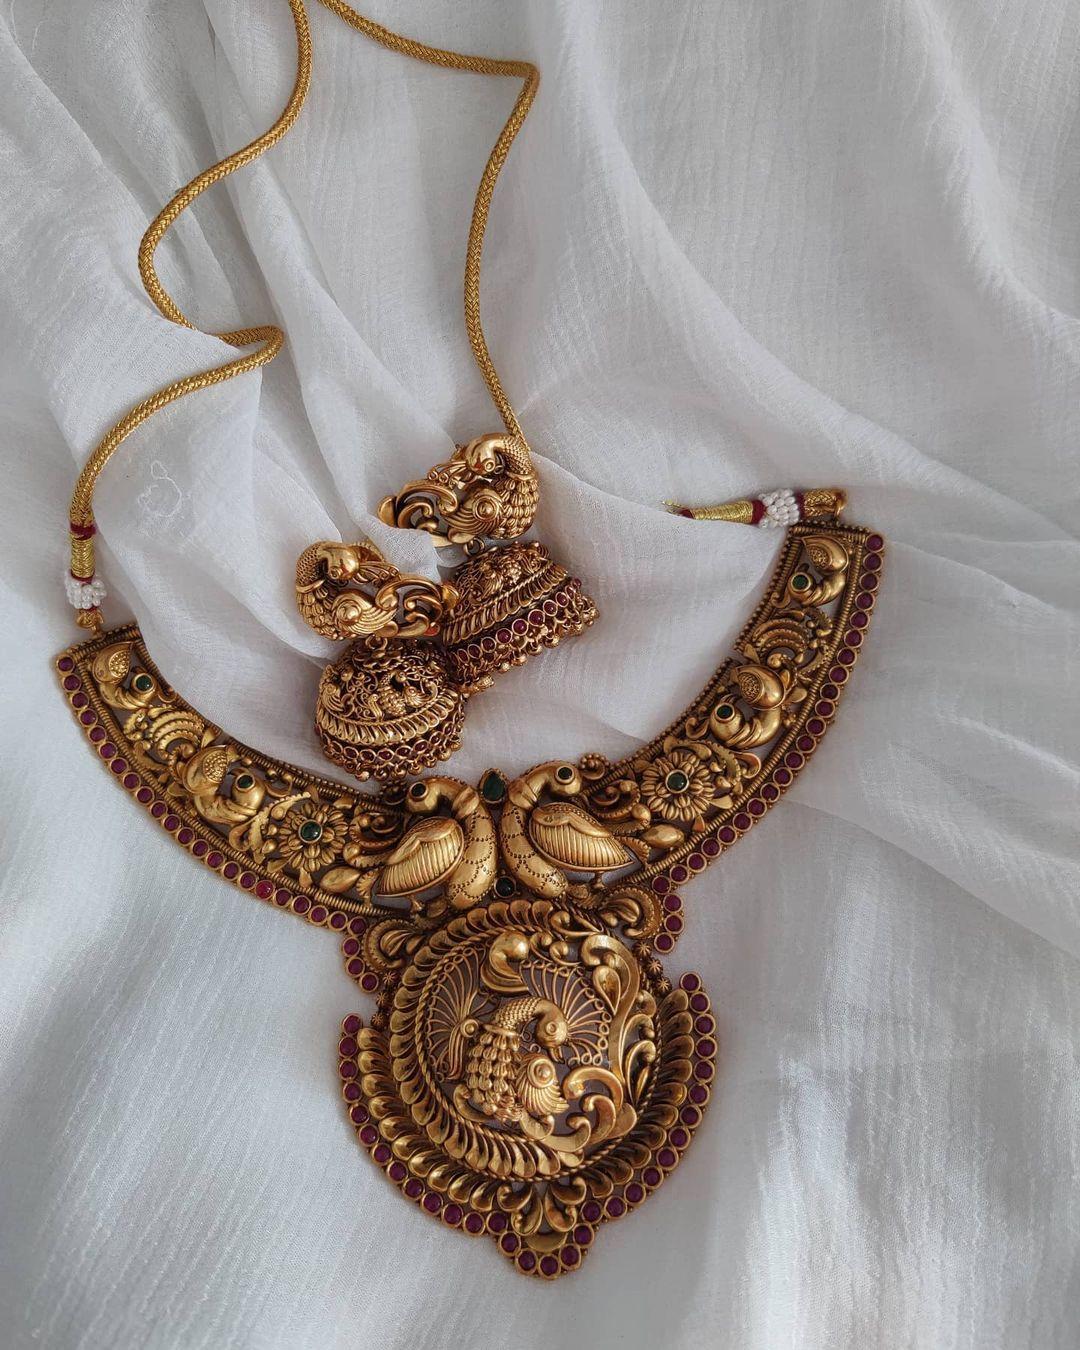 imitation-peacock-necklace